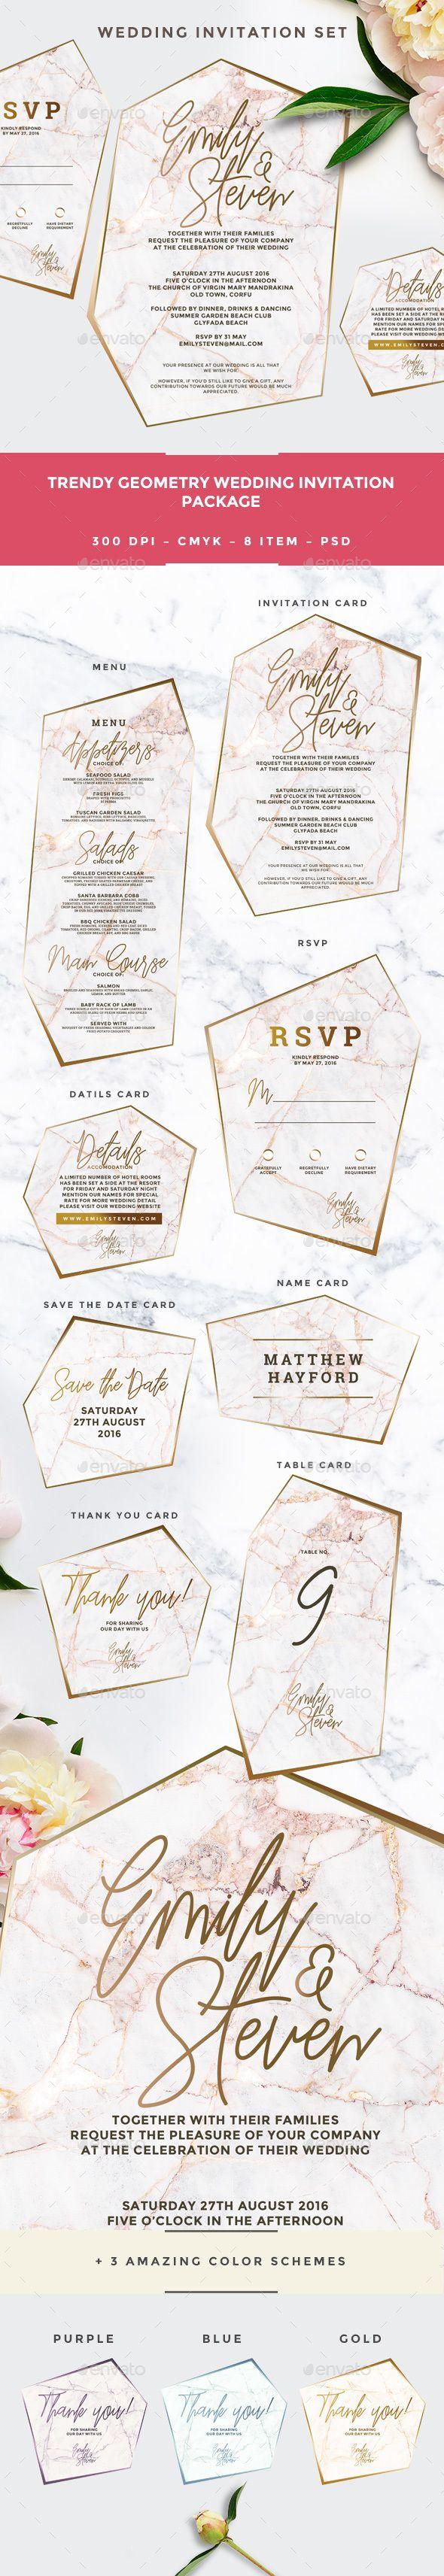 Wedding by BigWeek Wedding Package Includes: 8 easy editable PSD files鈥?20Invitation Card 鈥?207脳5 in鈥?20Save the Date Card 鈥?204脳4 in鈥?20RSVP 鈥?205脳8 in鈥?20Name ca